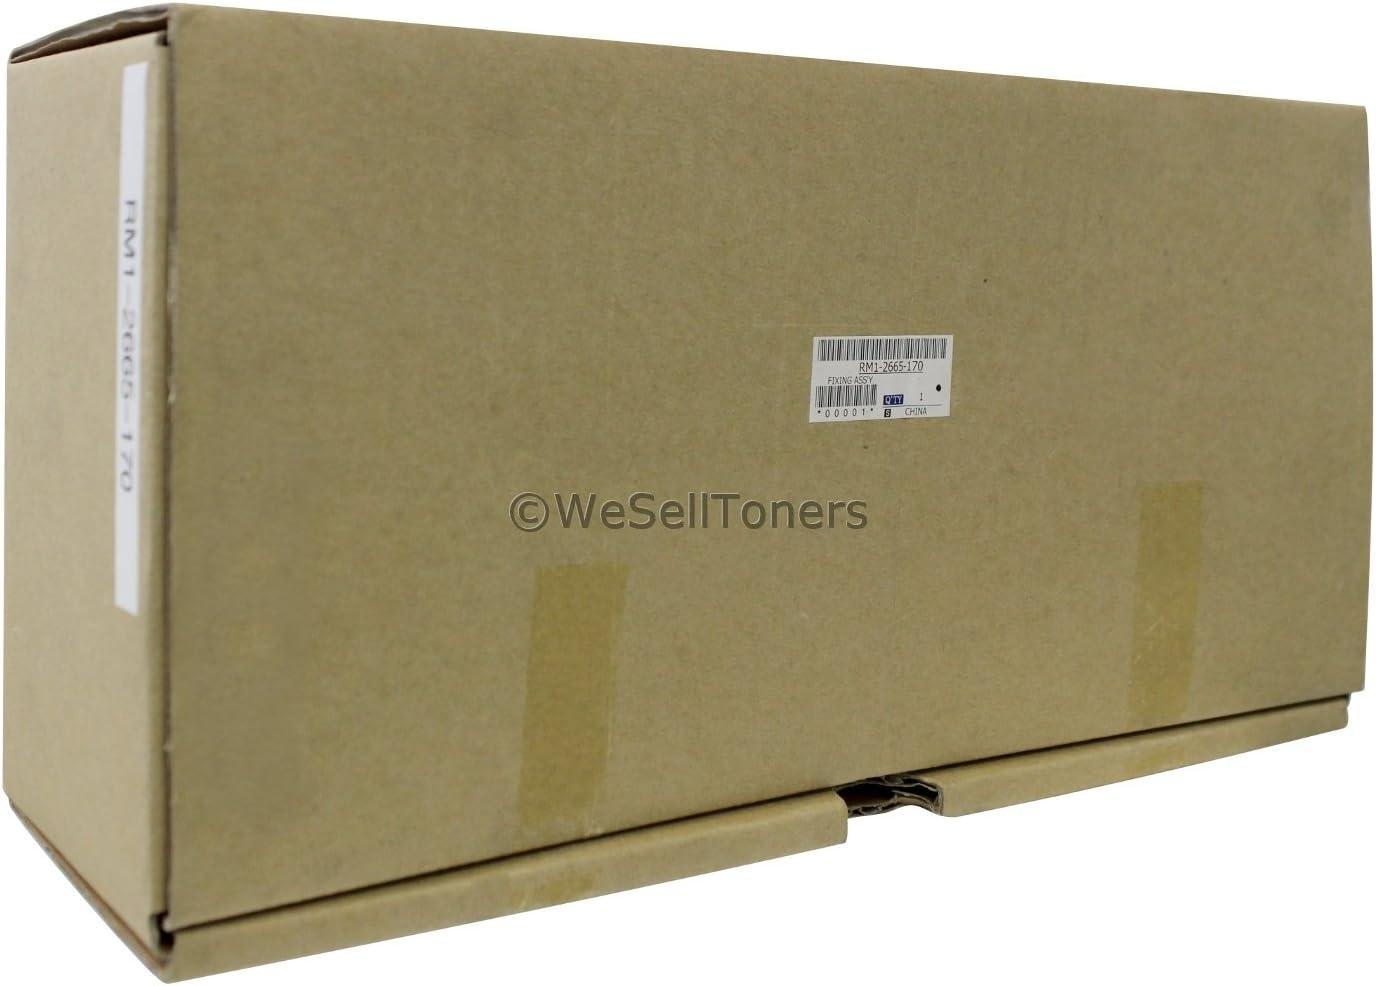 NEW HP 3600 / 3800 Fuser RM1-2665 RM1-2763 RC1-7606 OEM